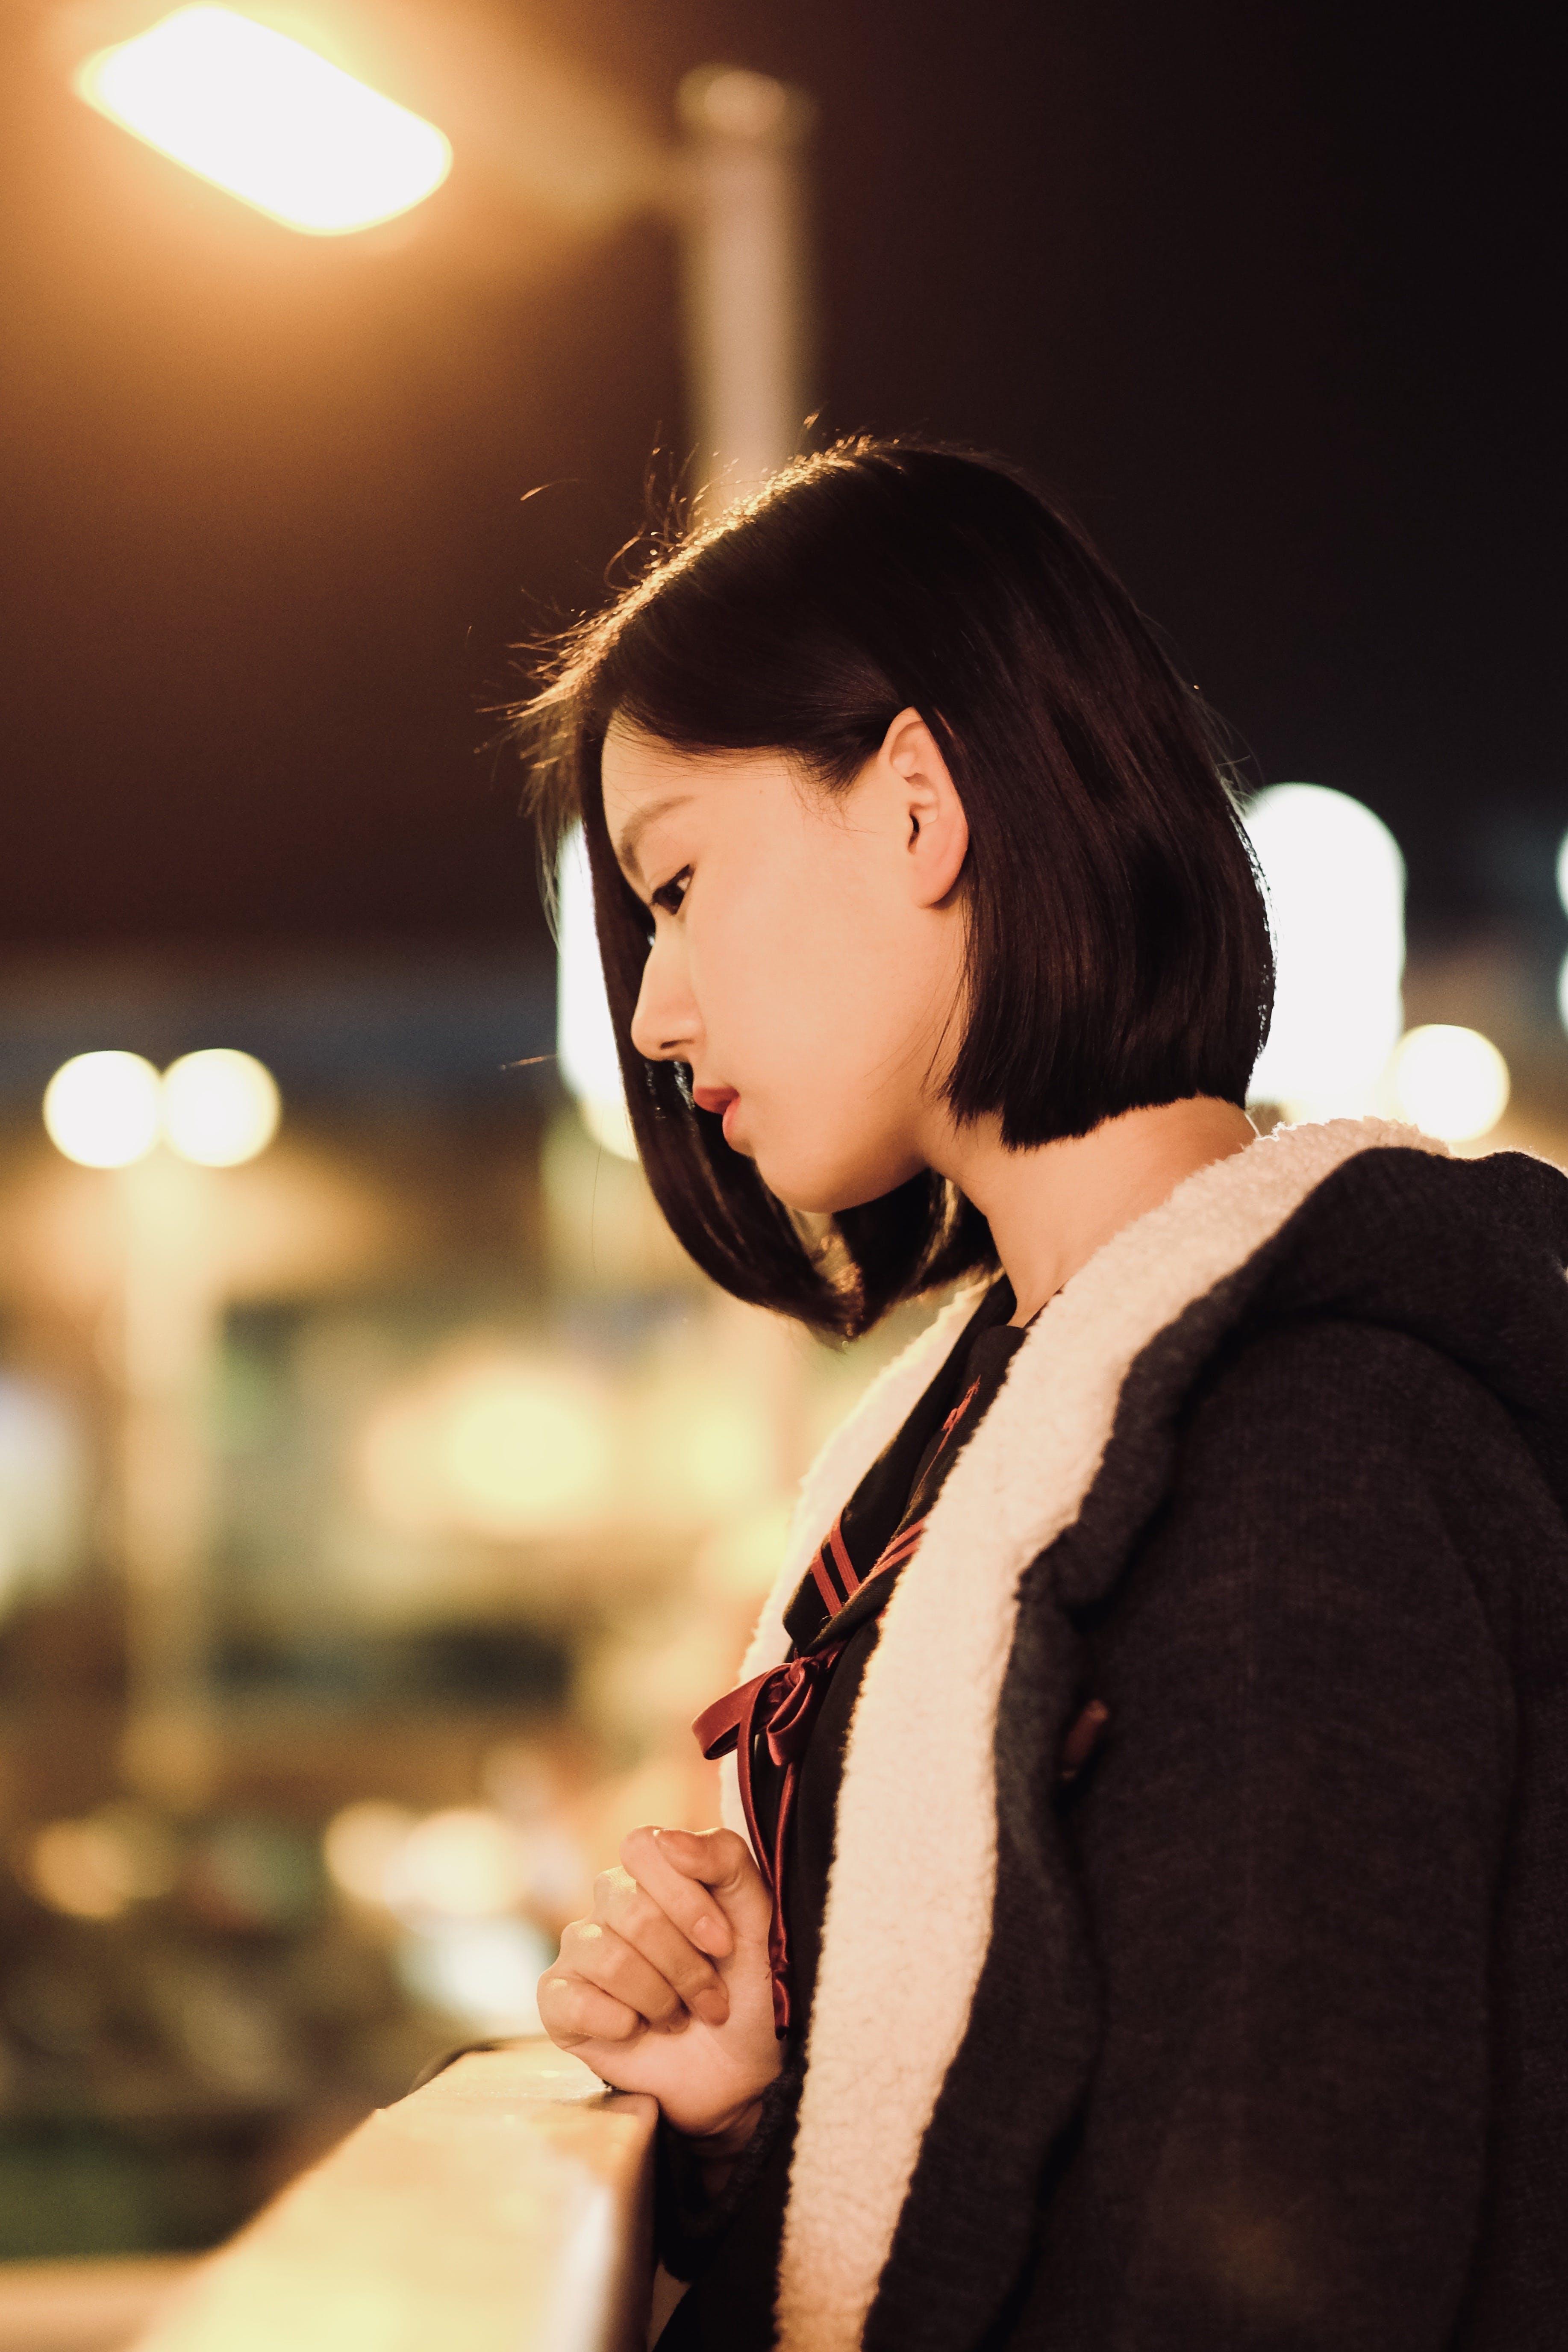 Woman Wearing Black And White Fur Coat